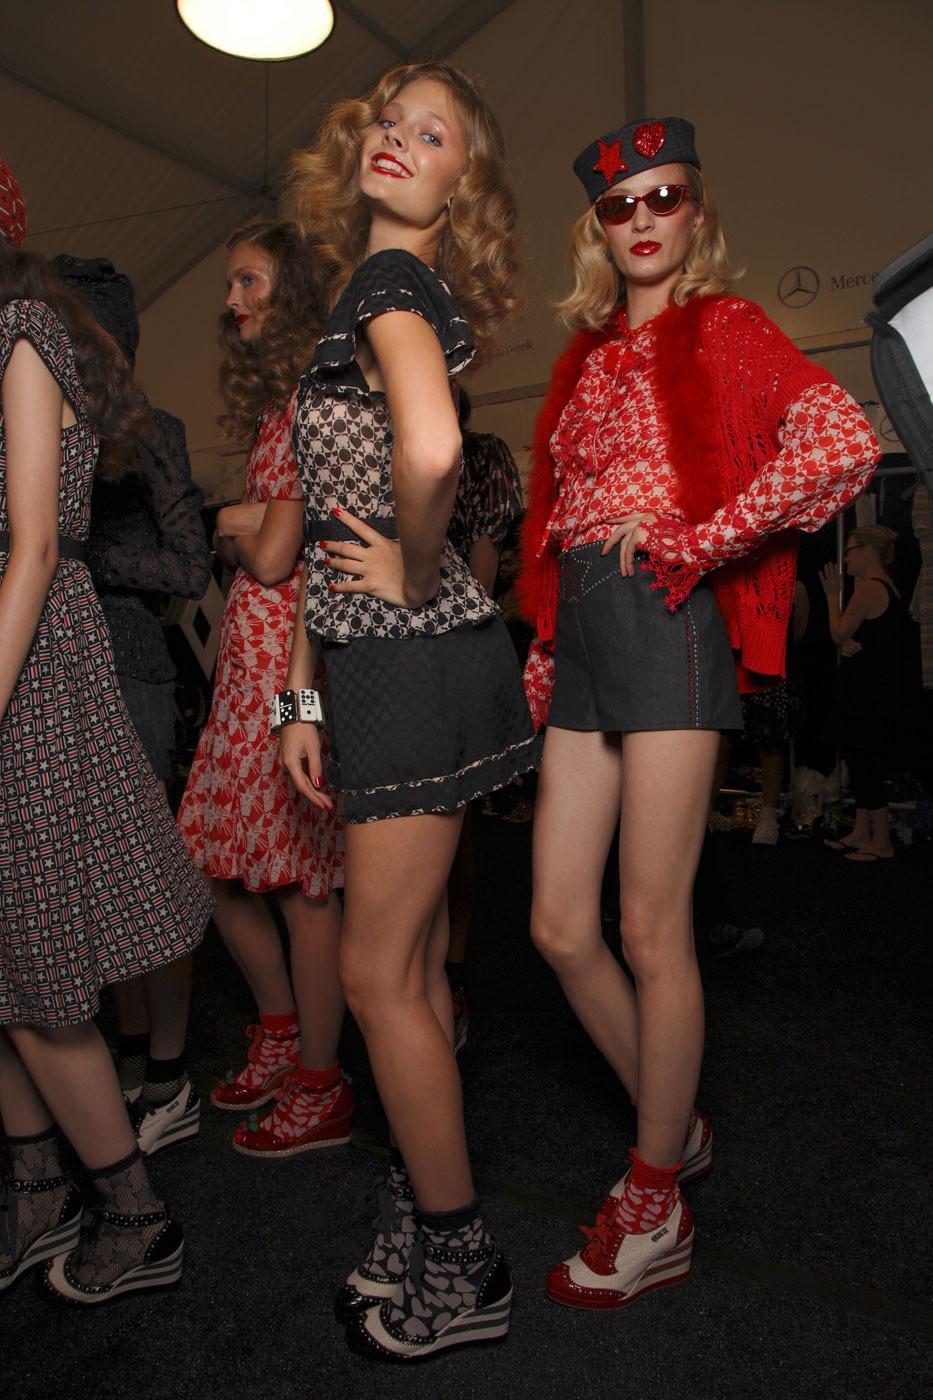 Anna Sui Spring 2012 Backstagefp 1 Cke 9 Vrw Mx